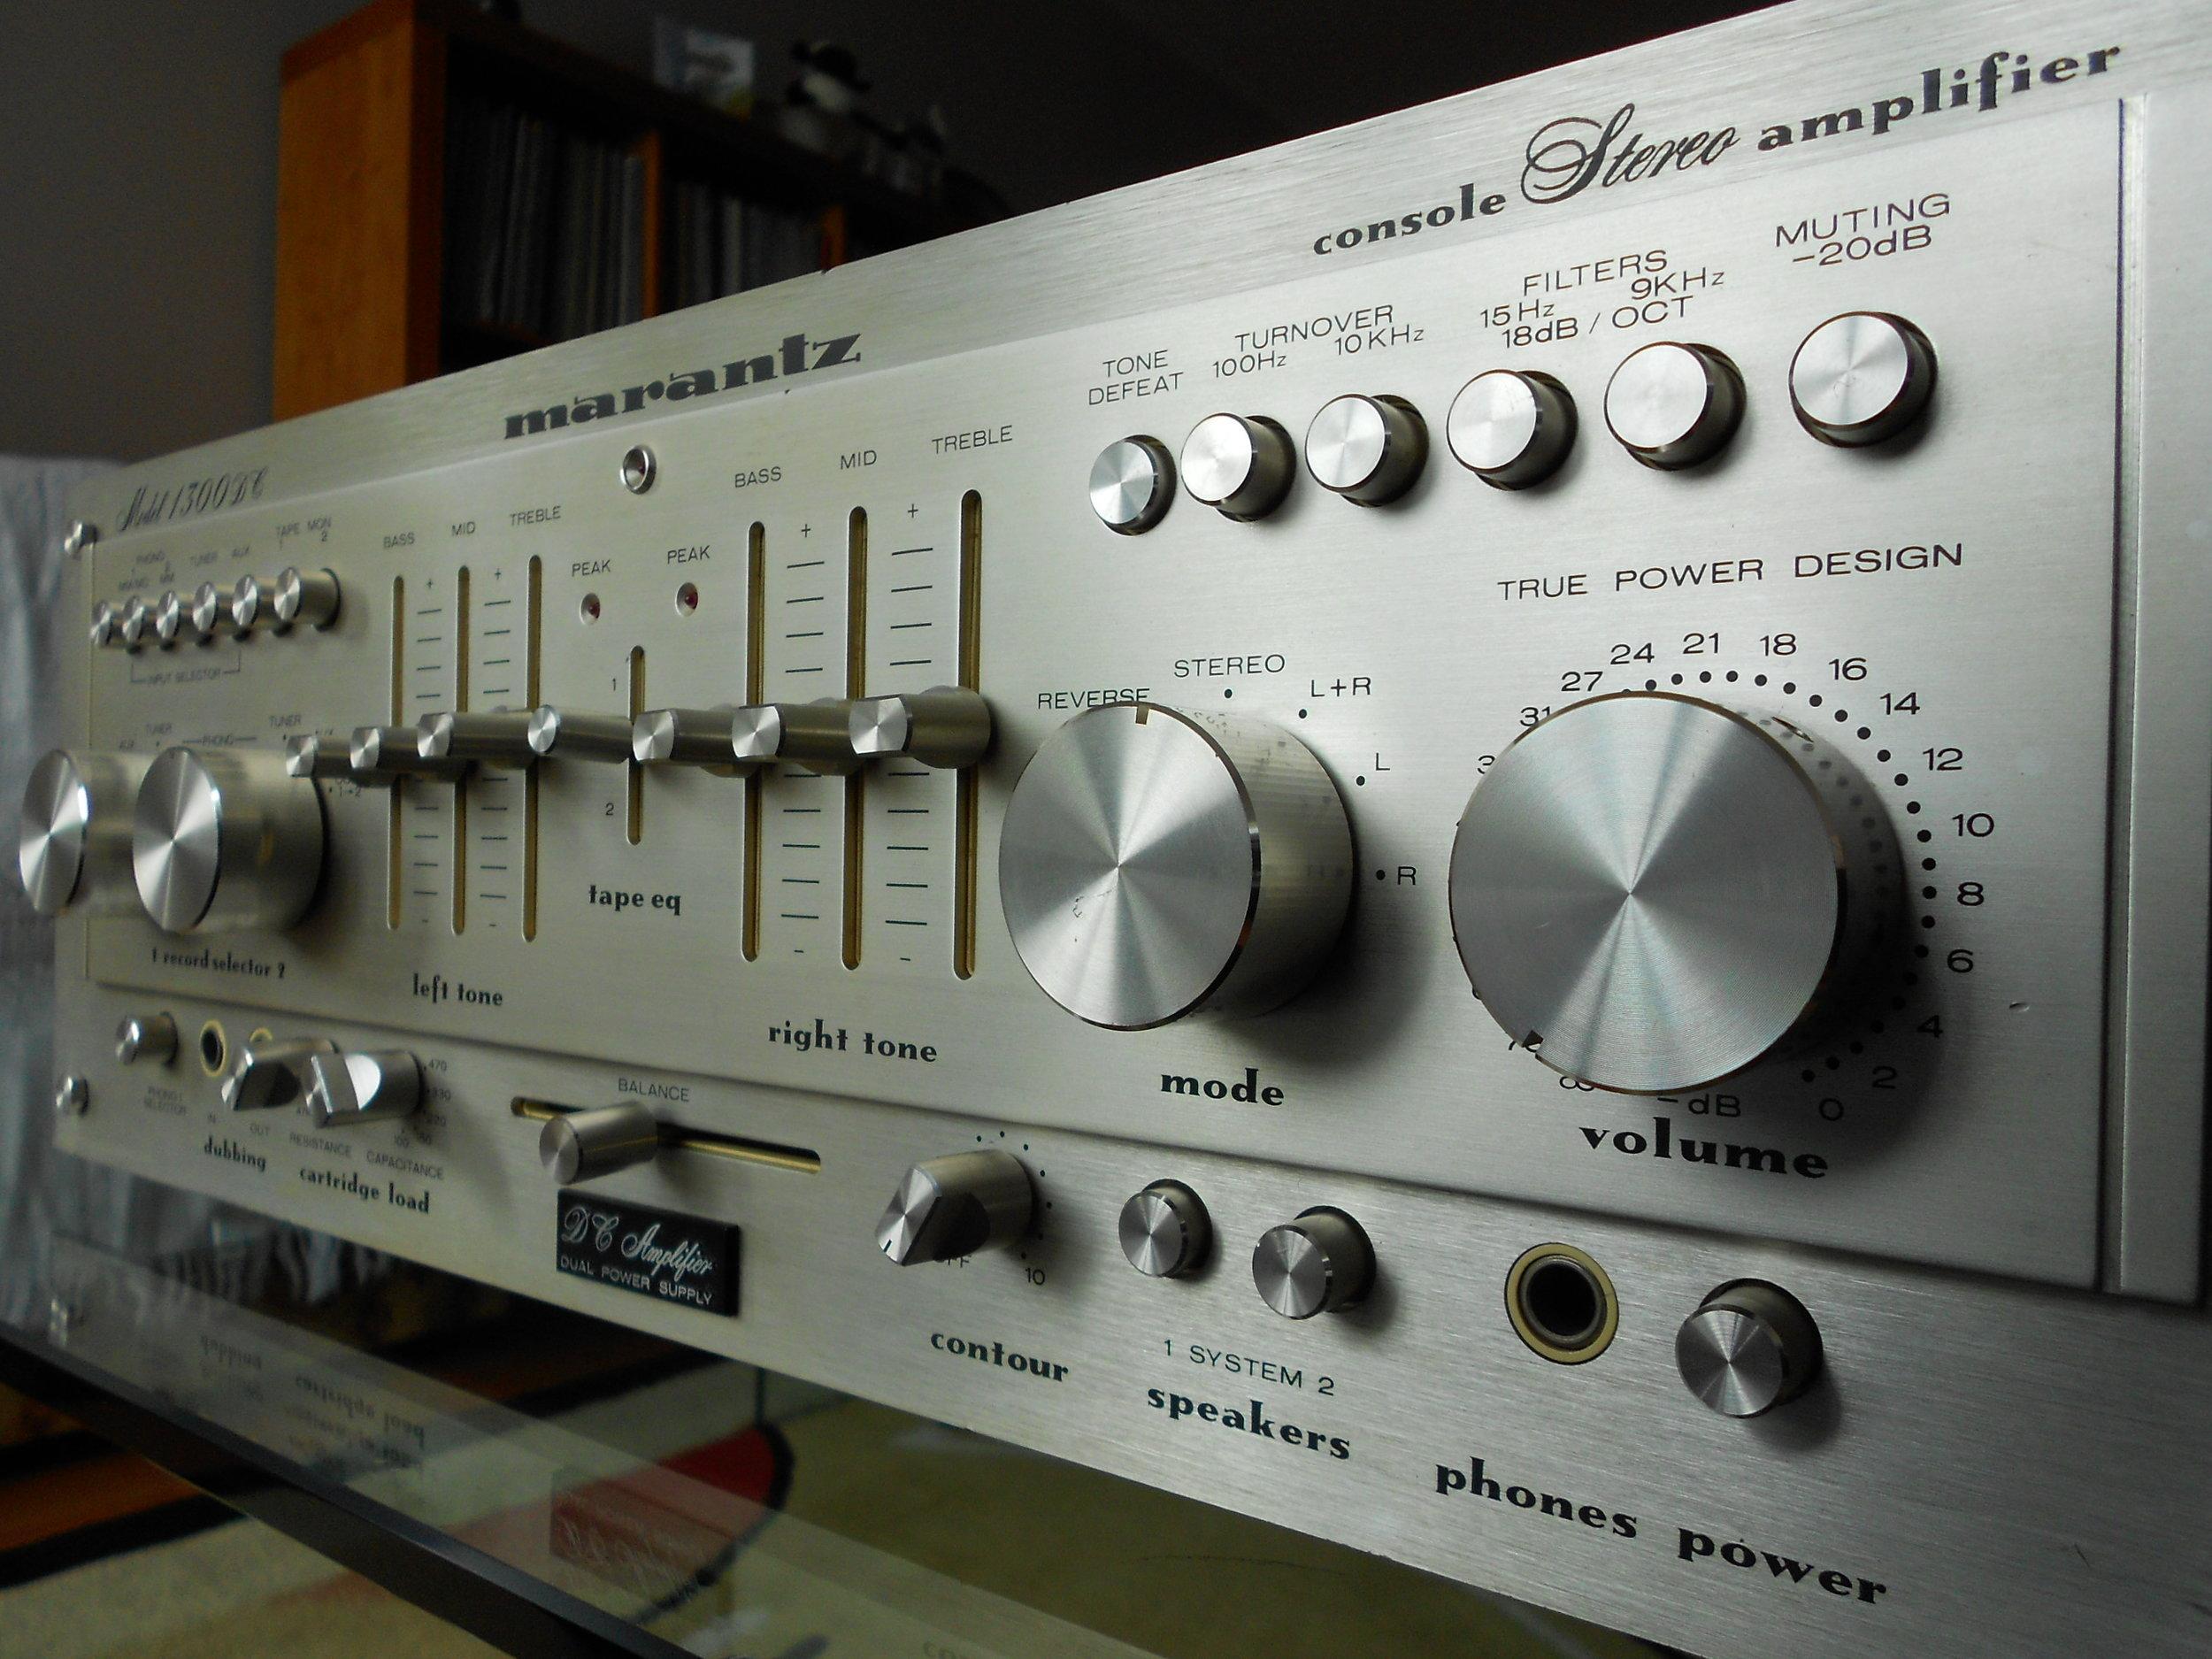 Marantz 1300 DC amplifier.